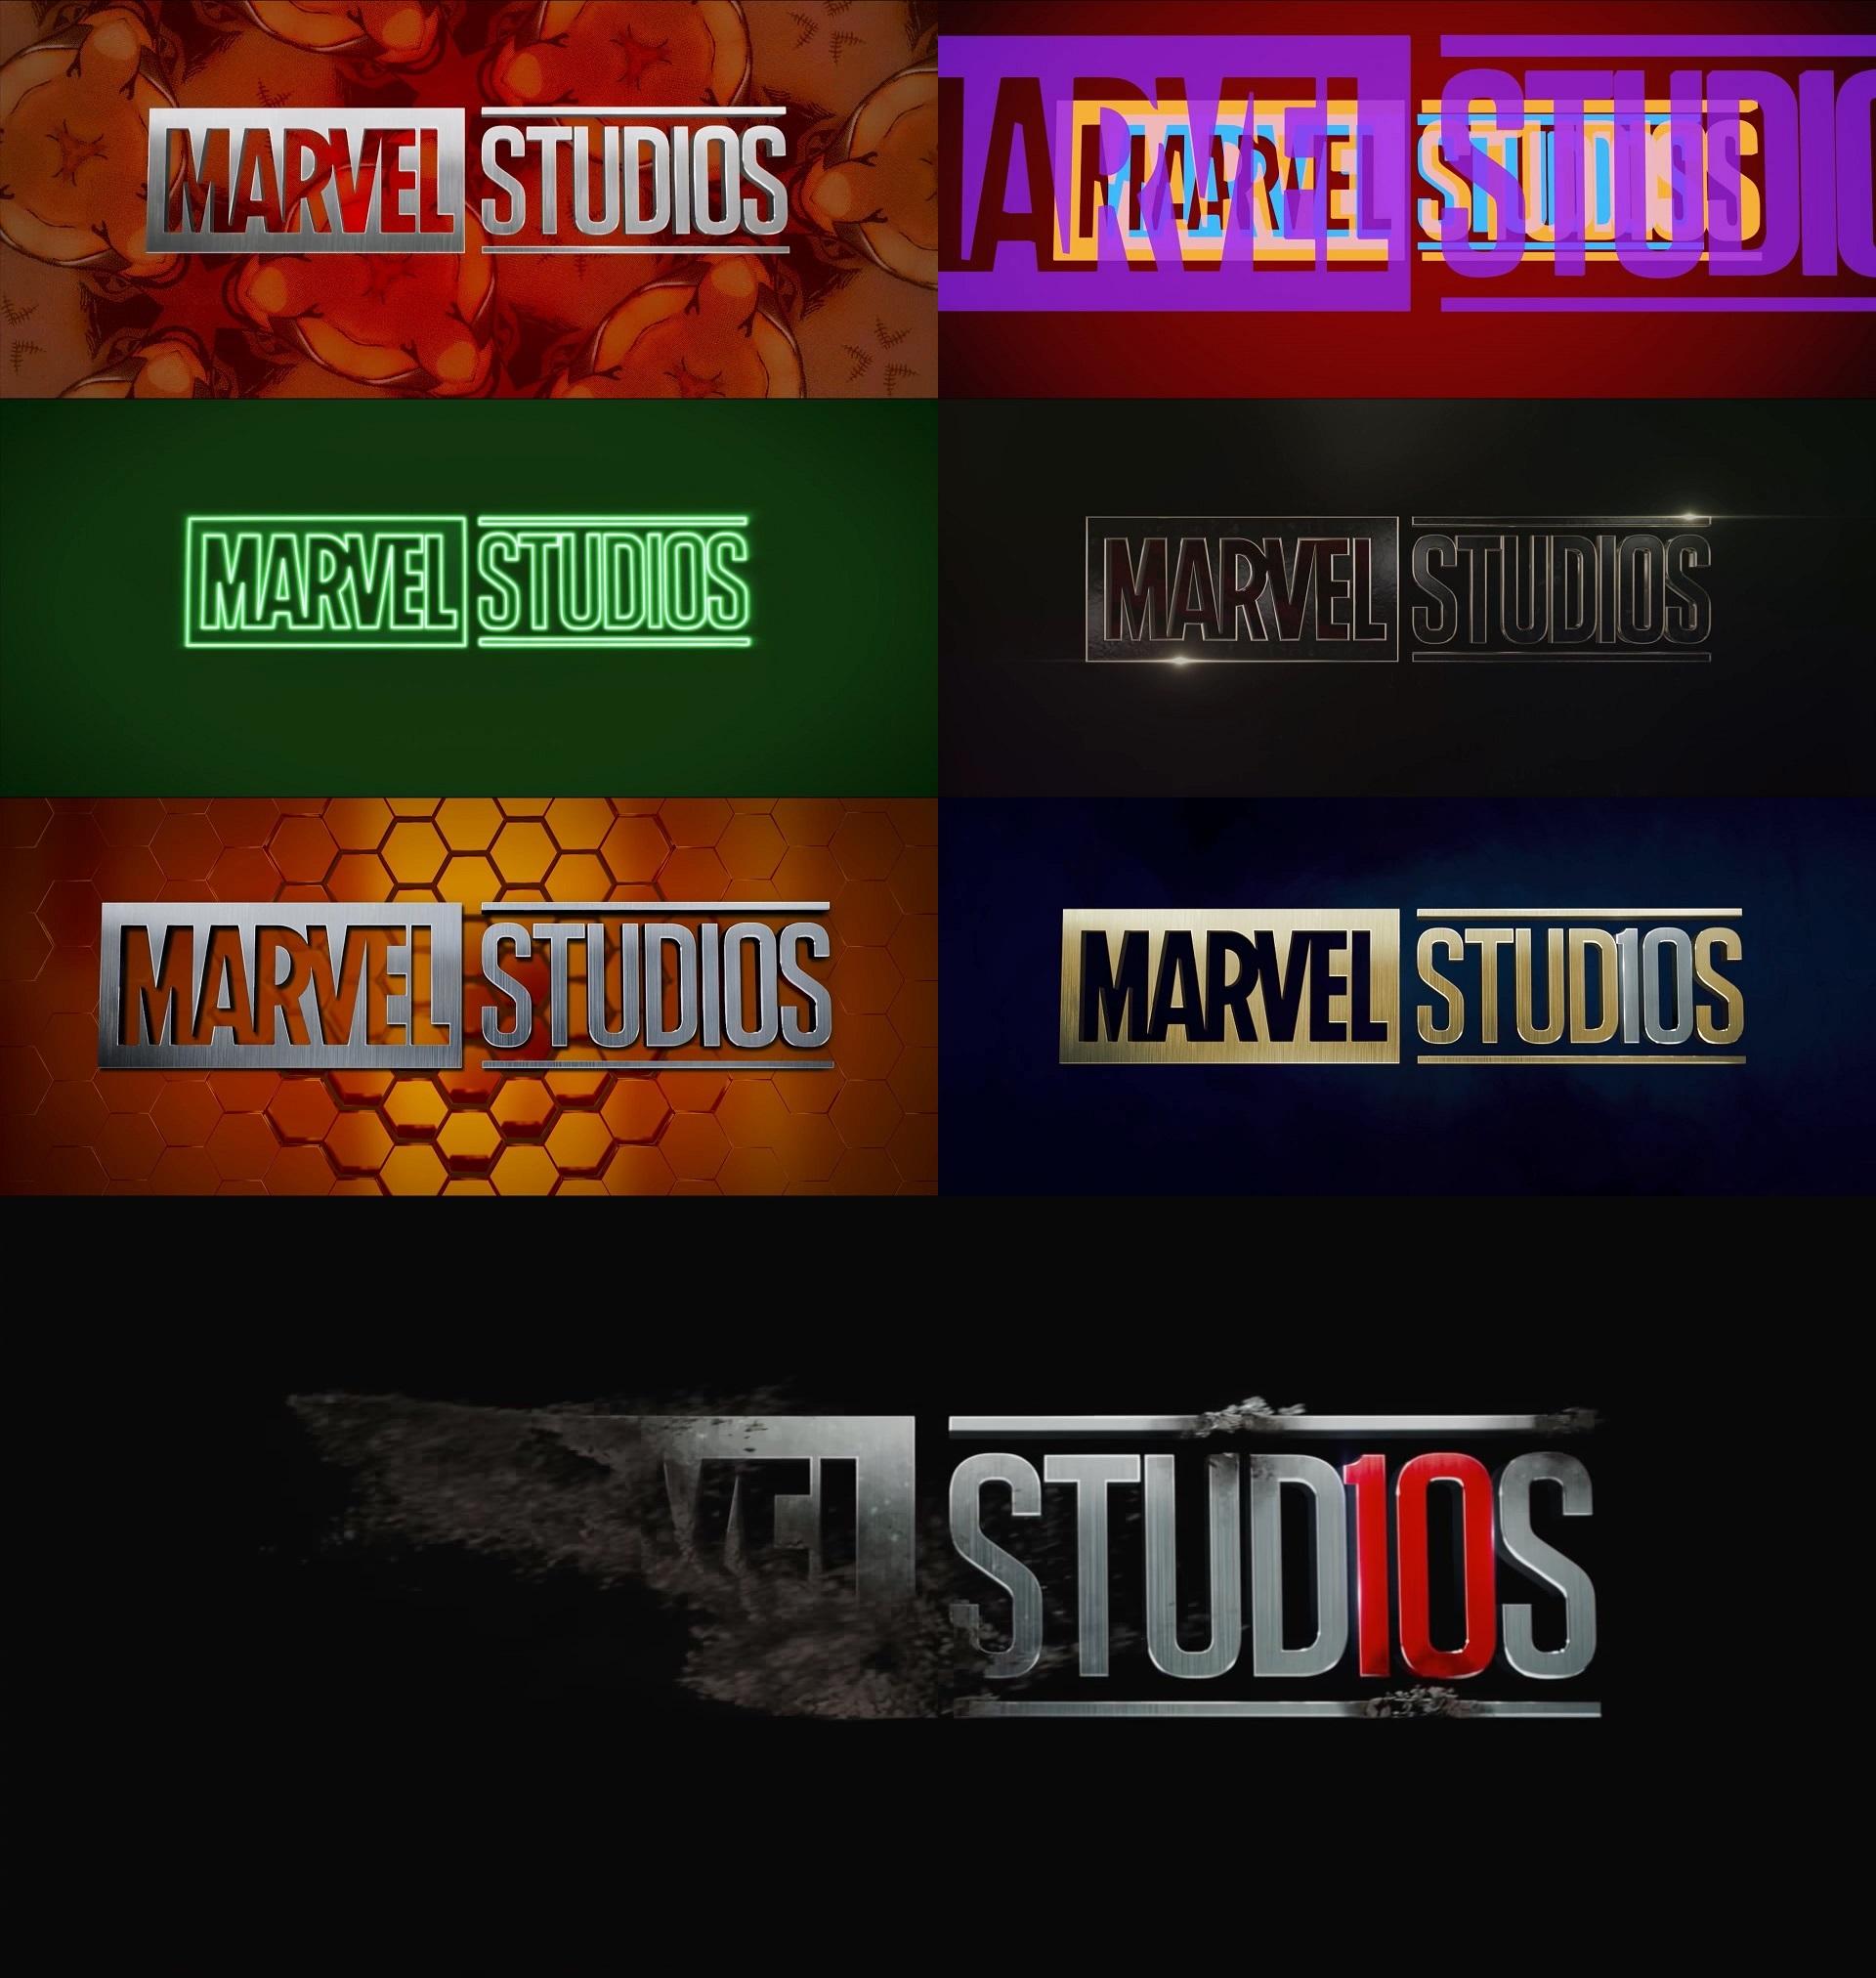 Marvel Studios\' trailer logo throughout Phase 3 : marvelstudios.